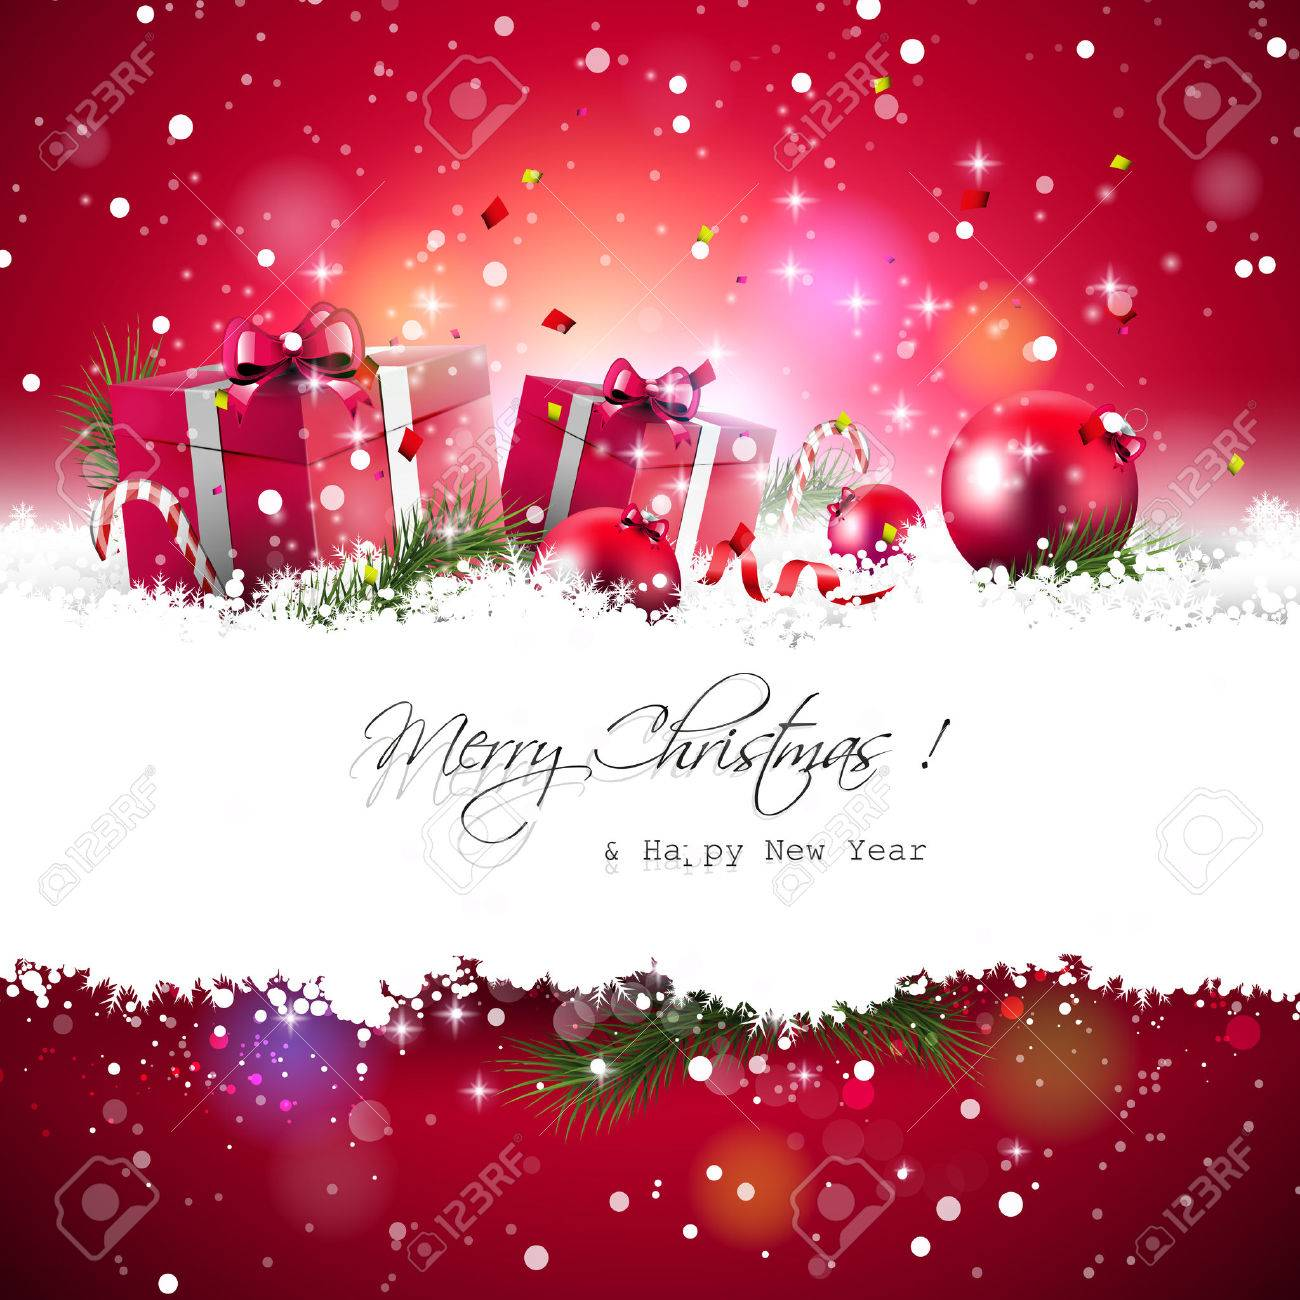 christmas background stock photos. royalty free christmas background